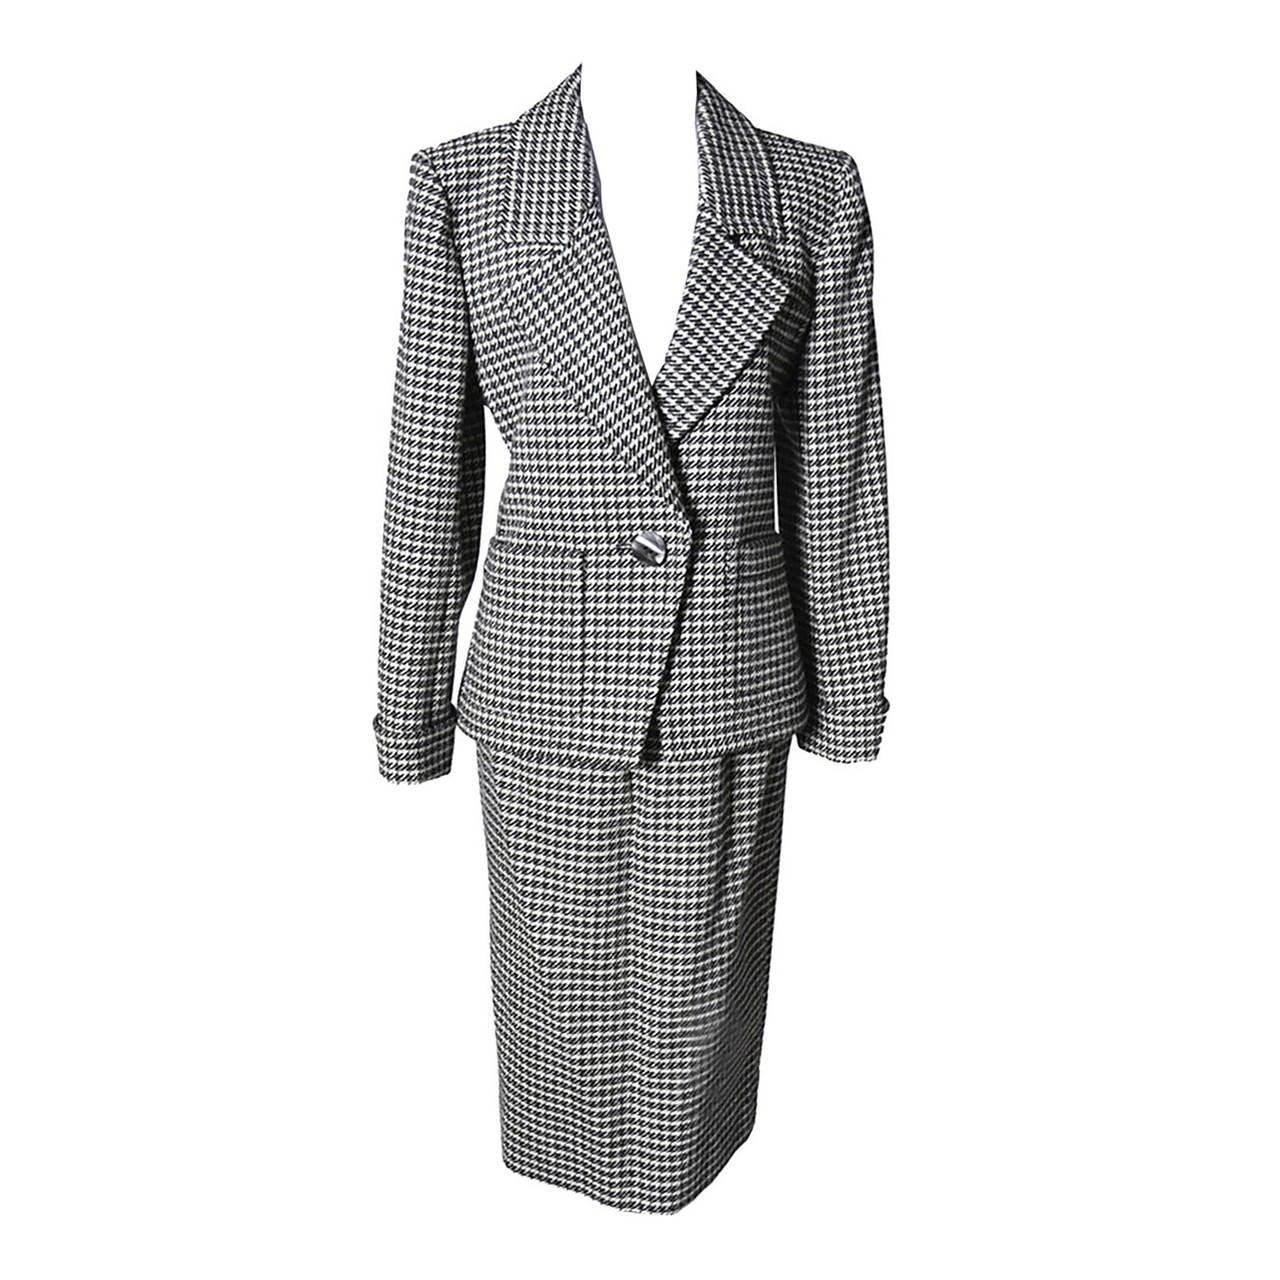 YSL Vintage Suit Houndstooth Wool Skirt Blazer Yves Saint Laurent Rive Gauche 1